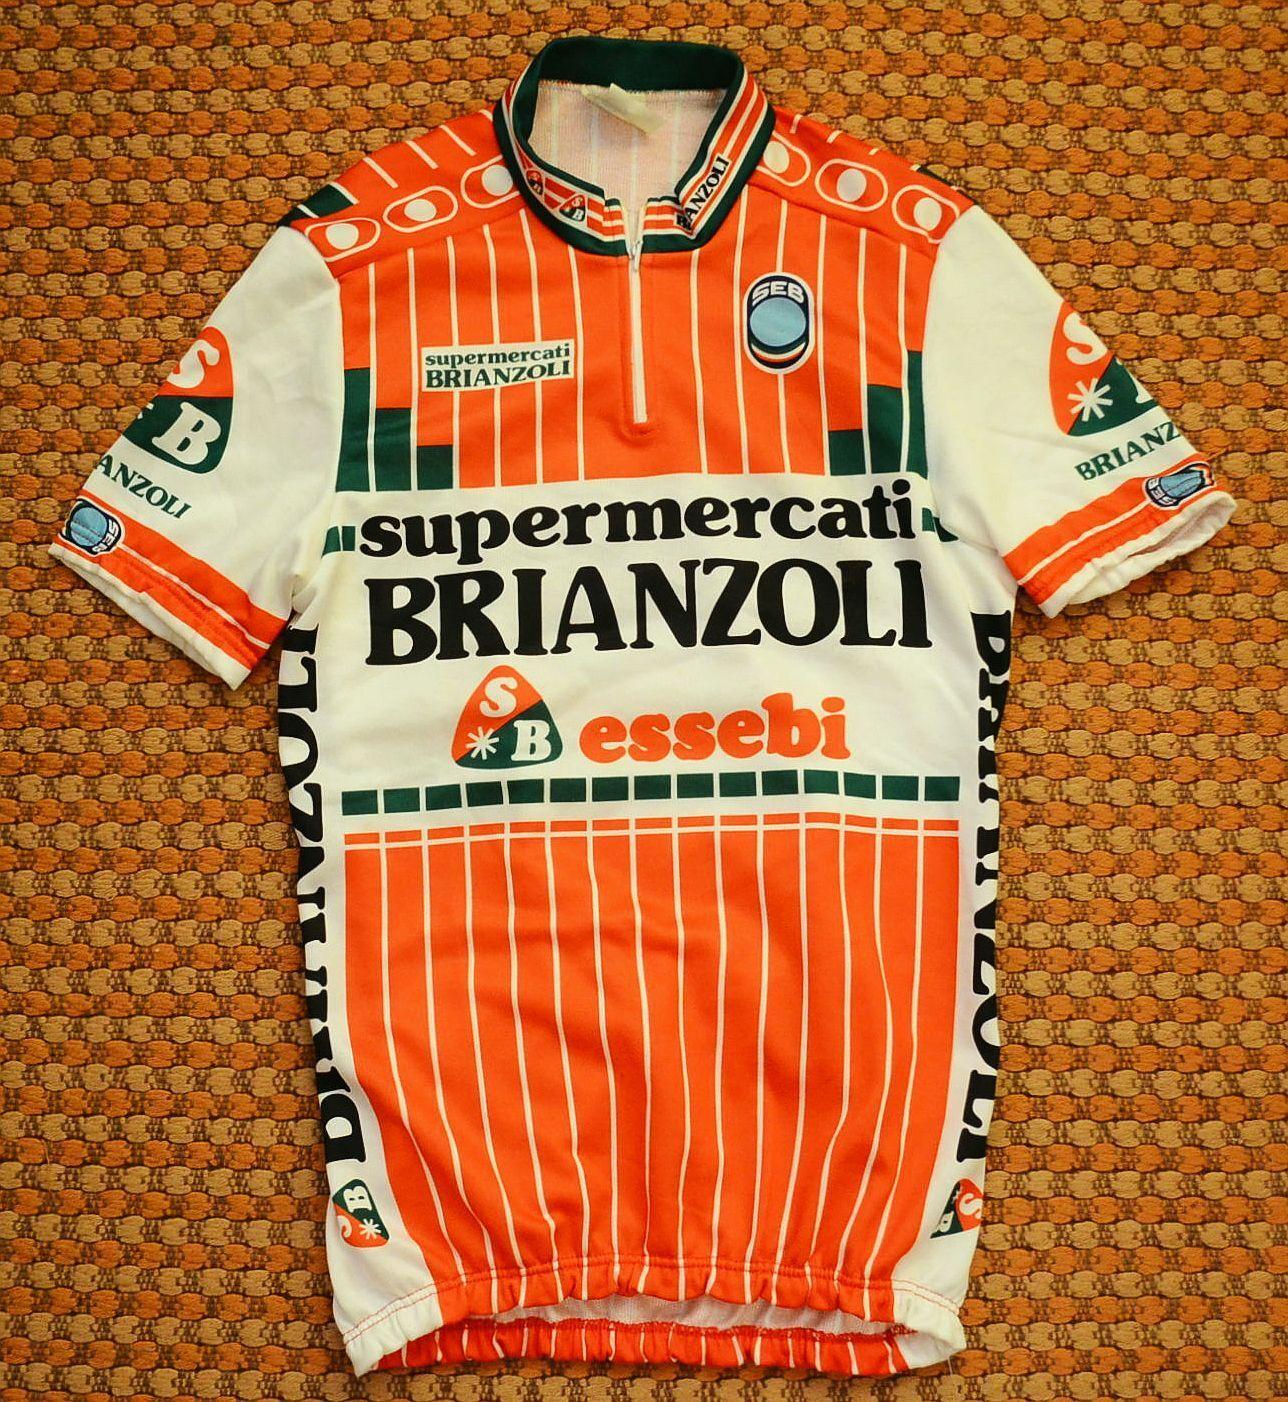 Supermercati Brianzoli, Mens cycling Shirt by SEB, Size Large